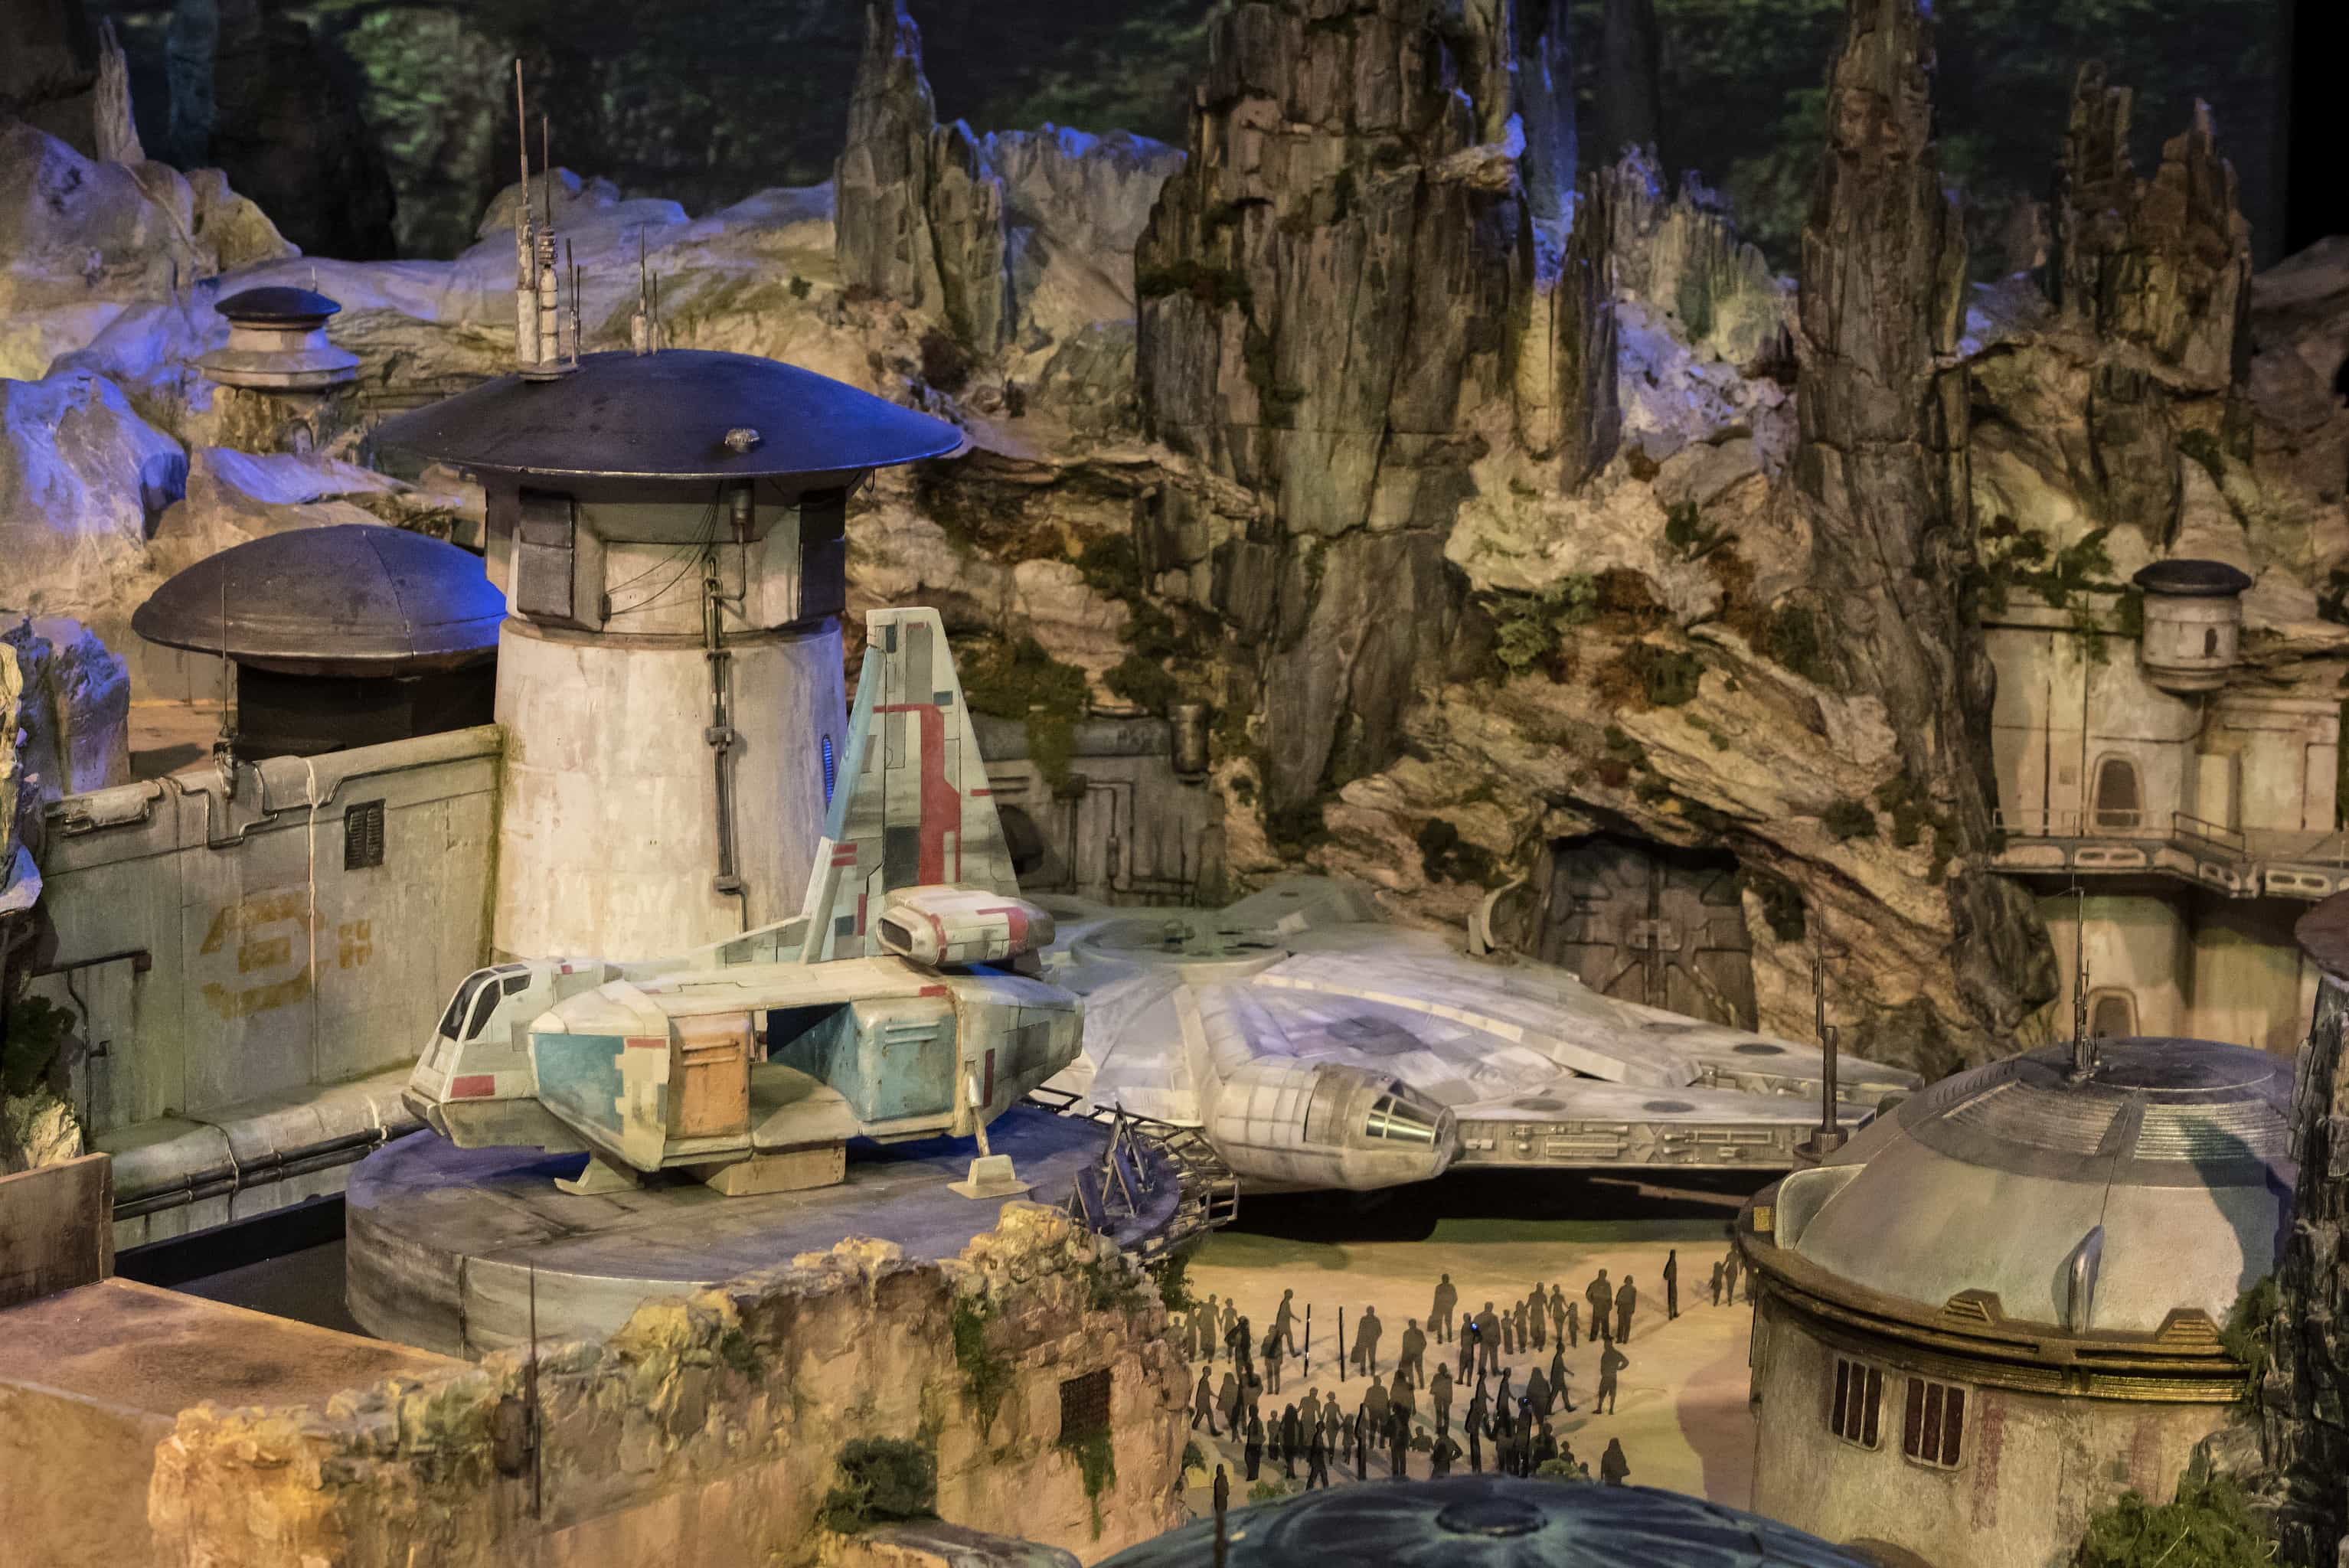 Star Wars Land's secret interactivity revealed?